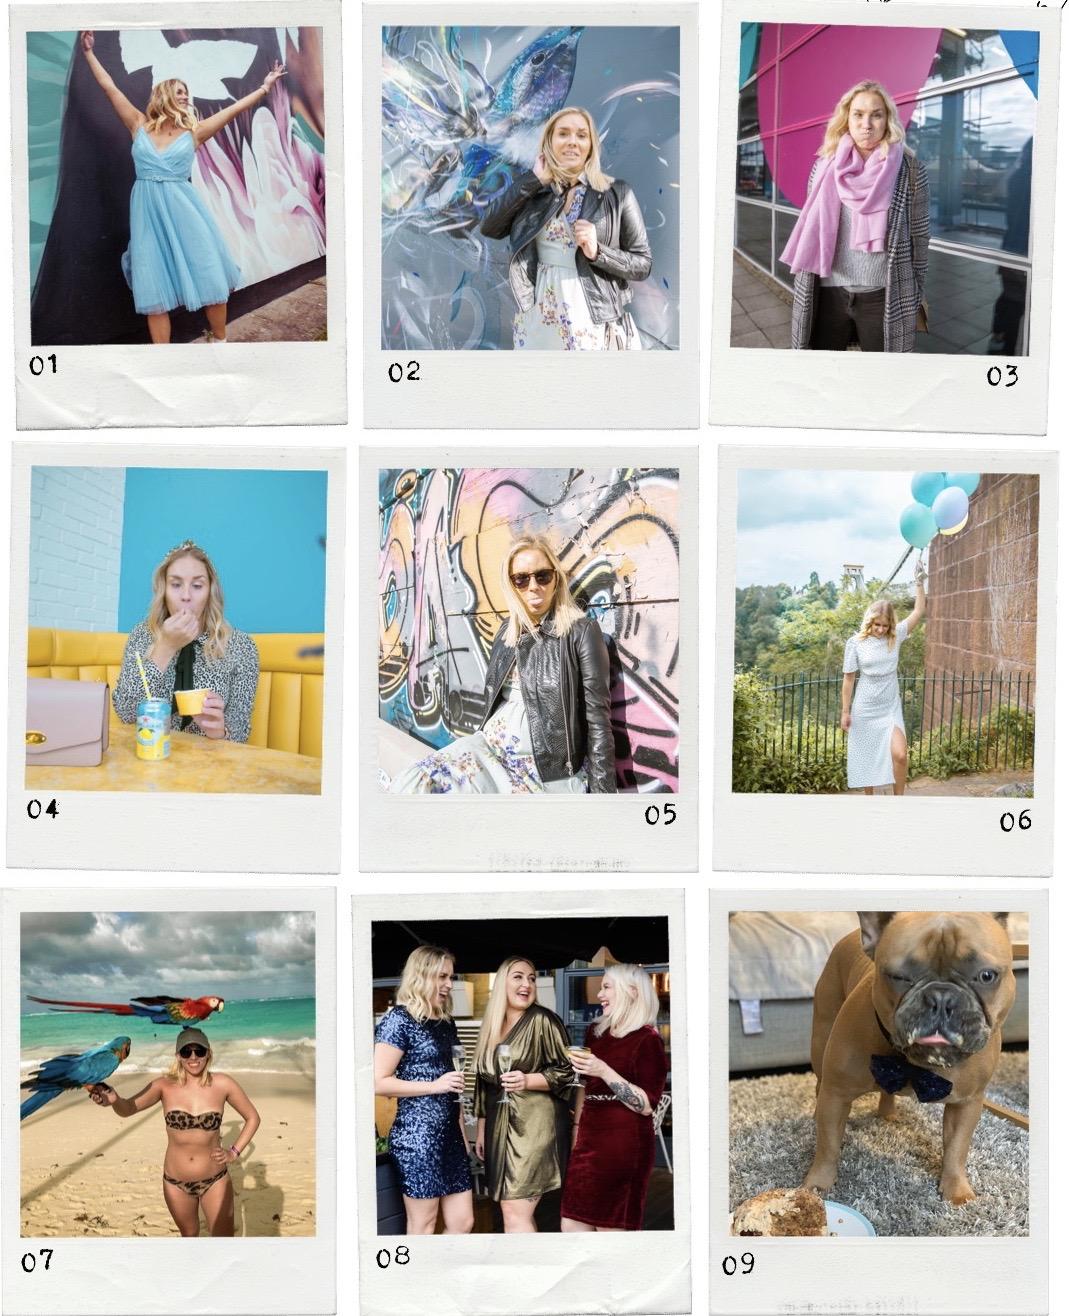 Rachel Emily Top Nine Outtakes of 2019 - Rachel Emily Blog